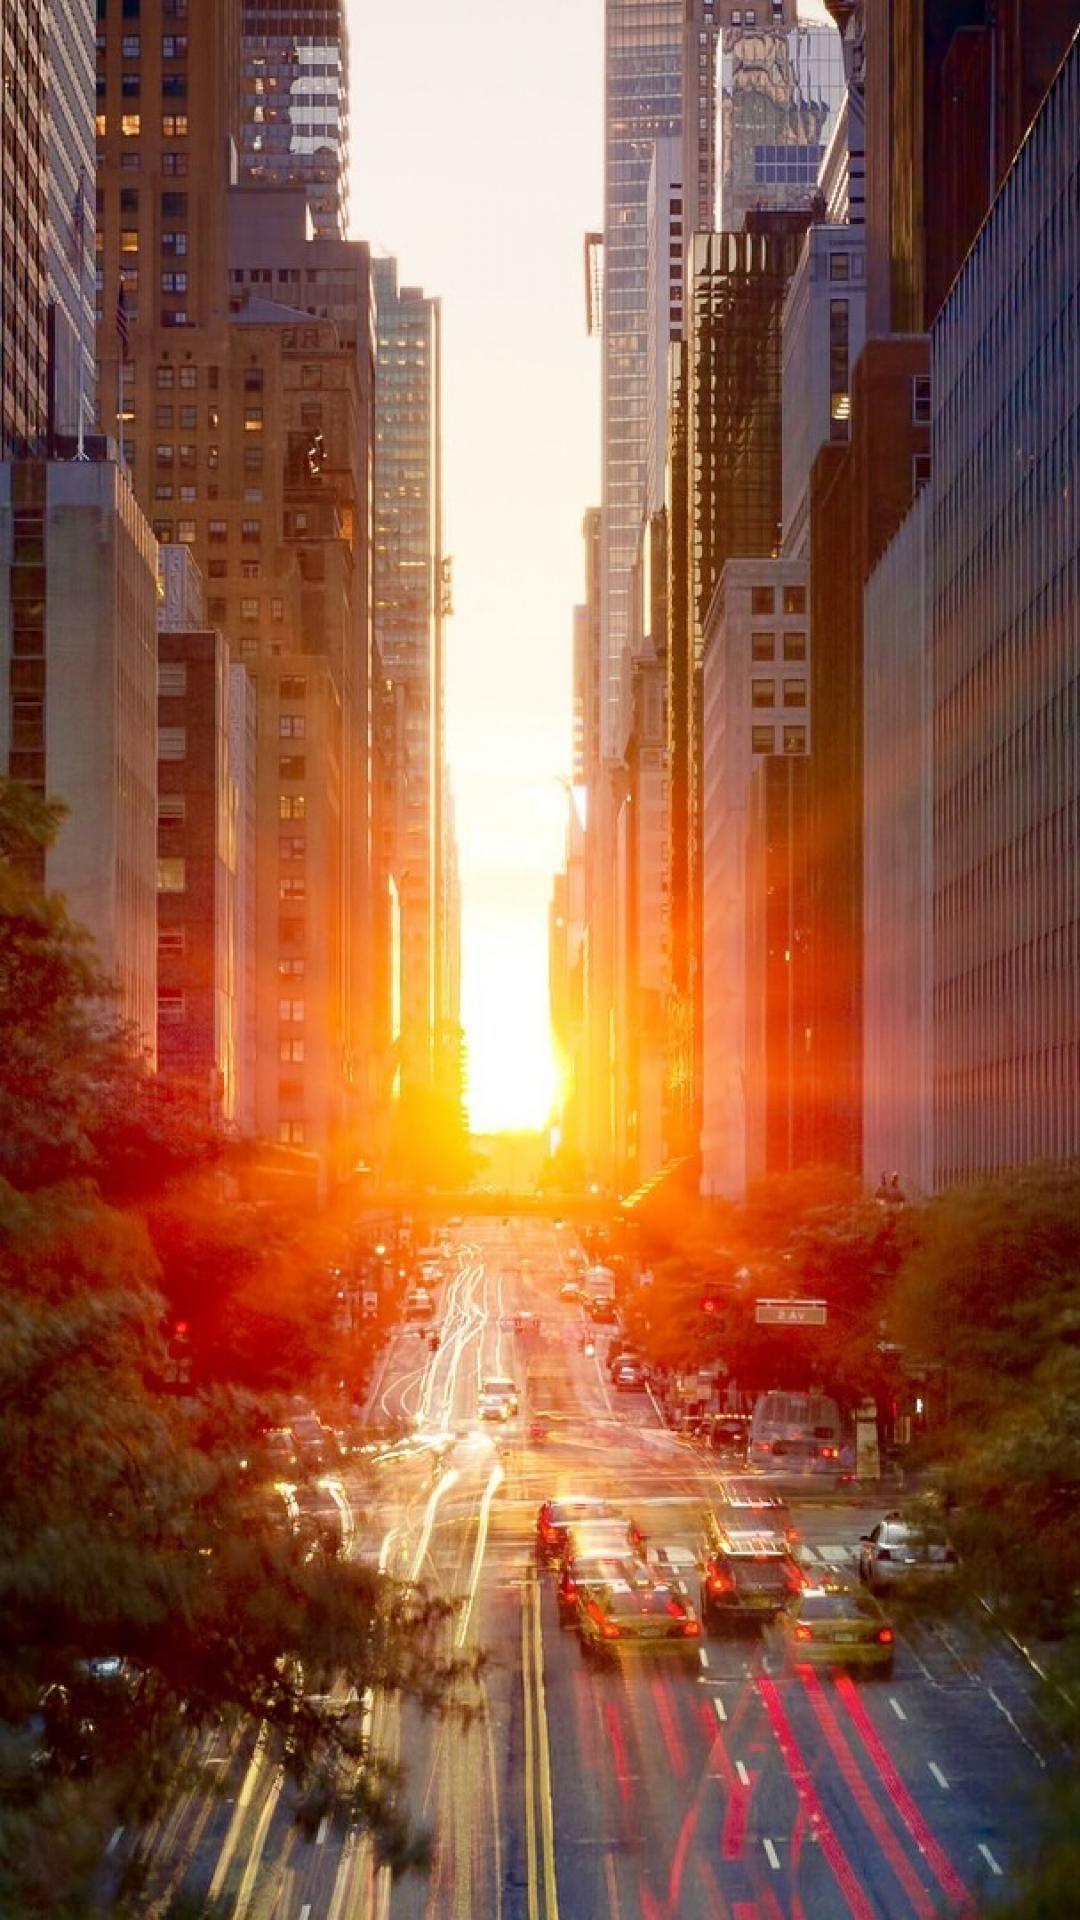 人気6位 ニューヨーク ニューヨーク 夜景 夜景 壁紙 風景